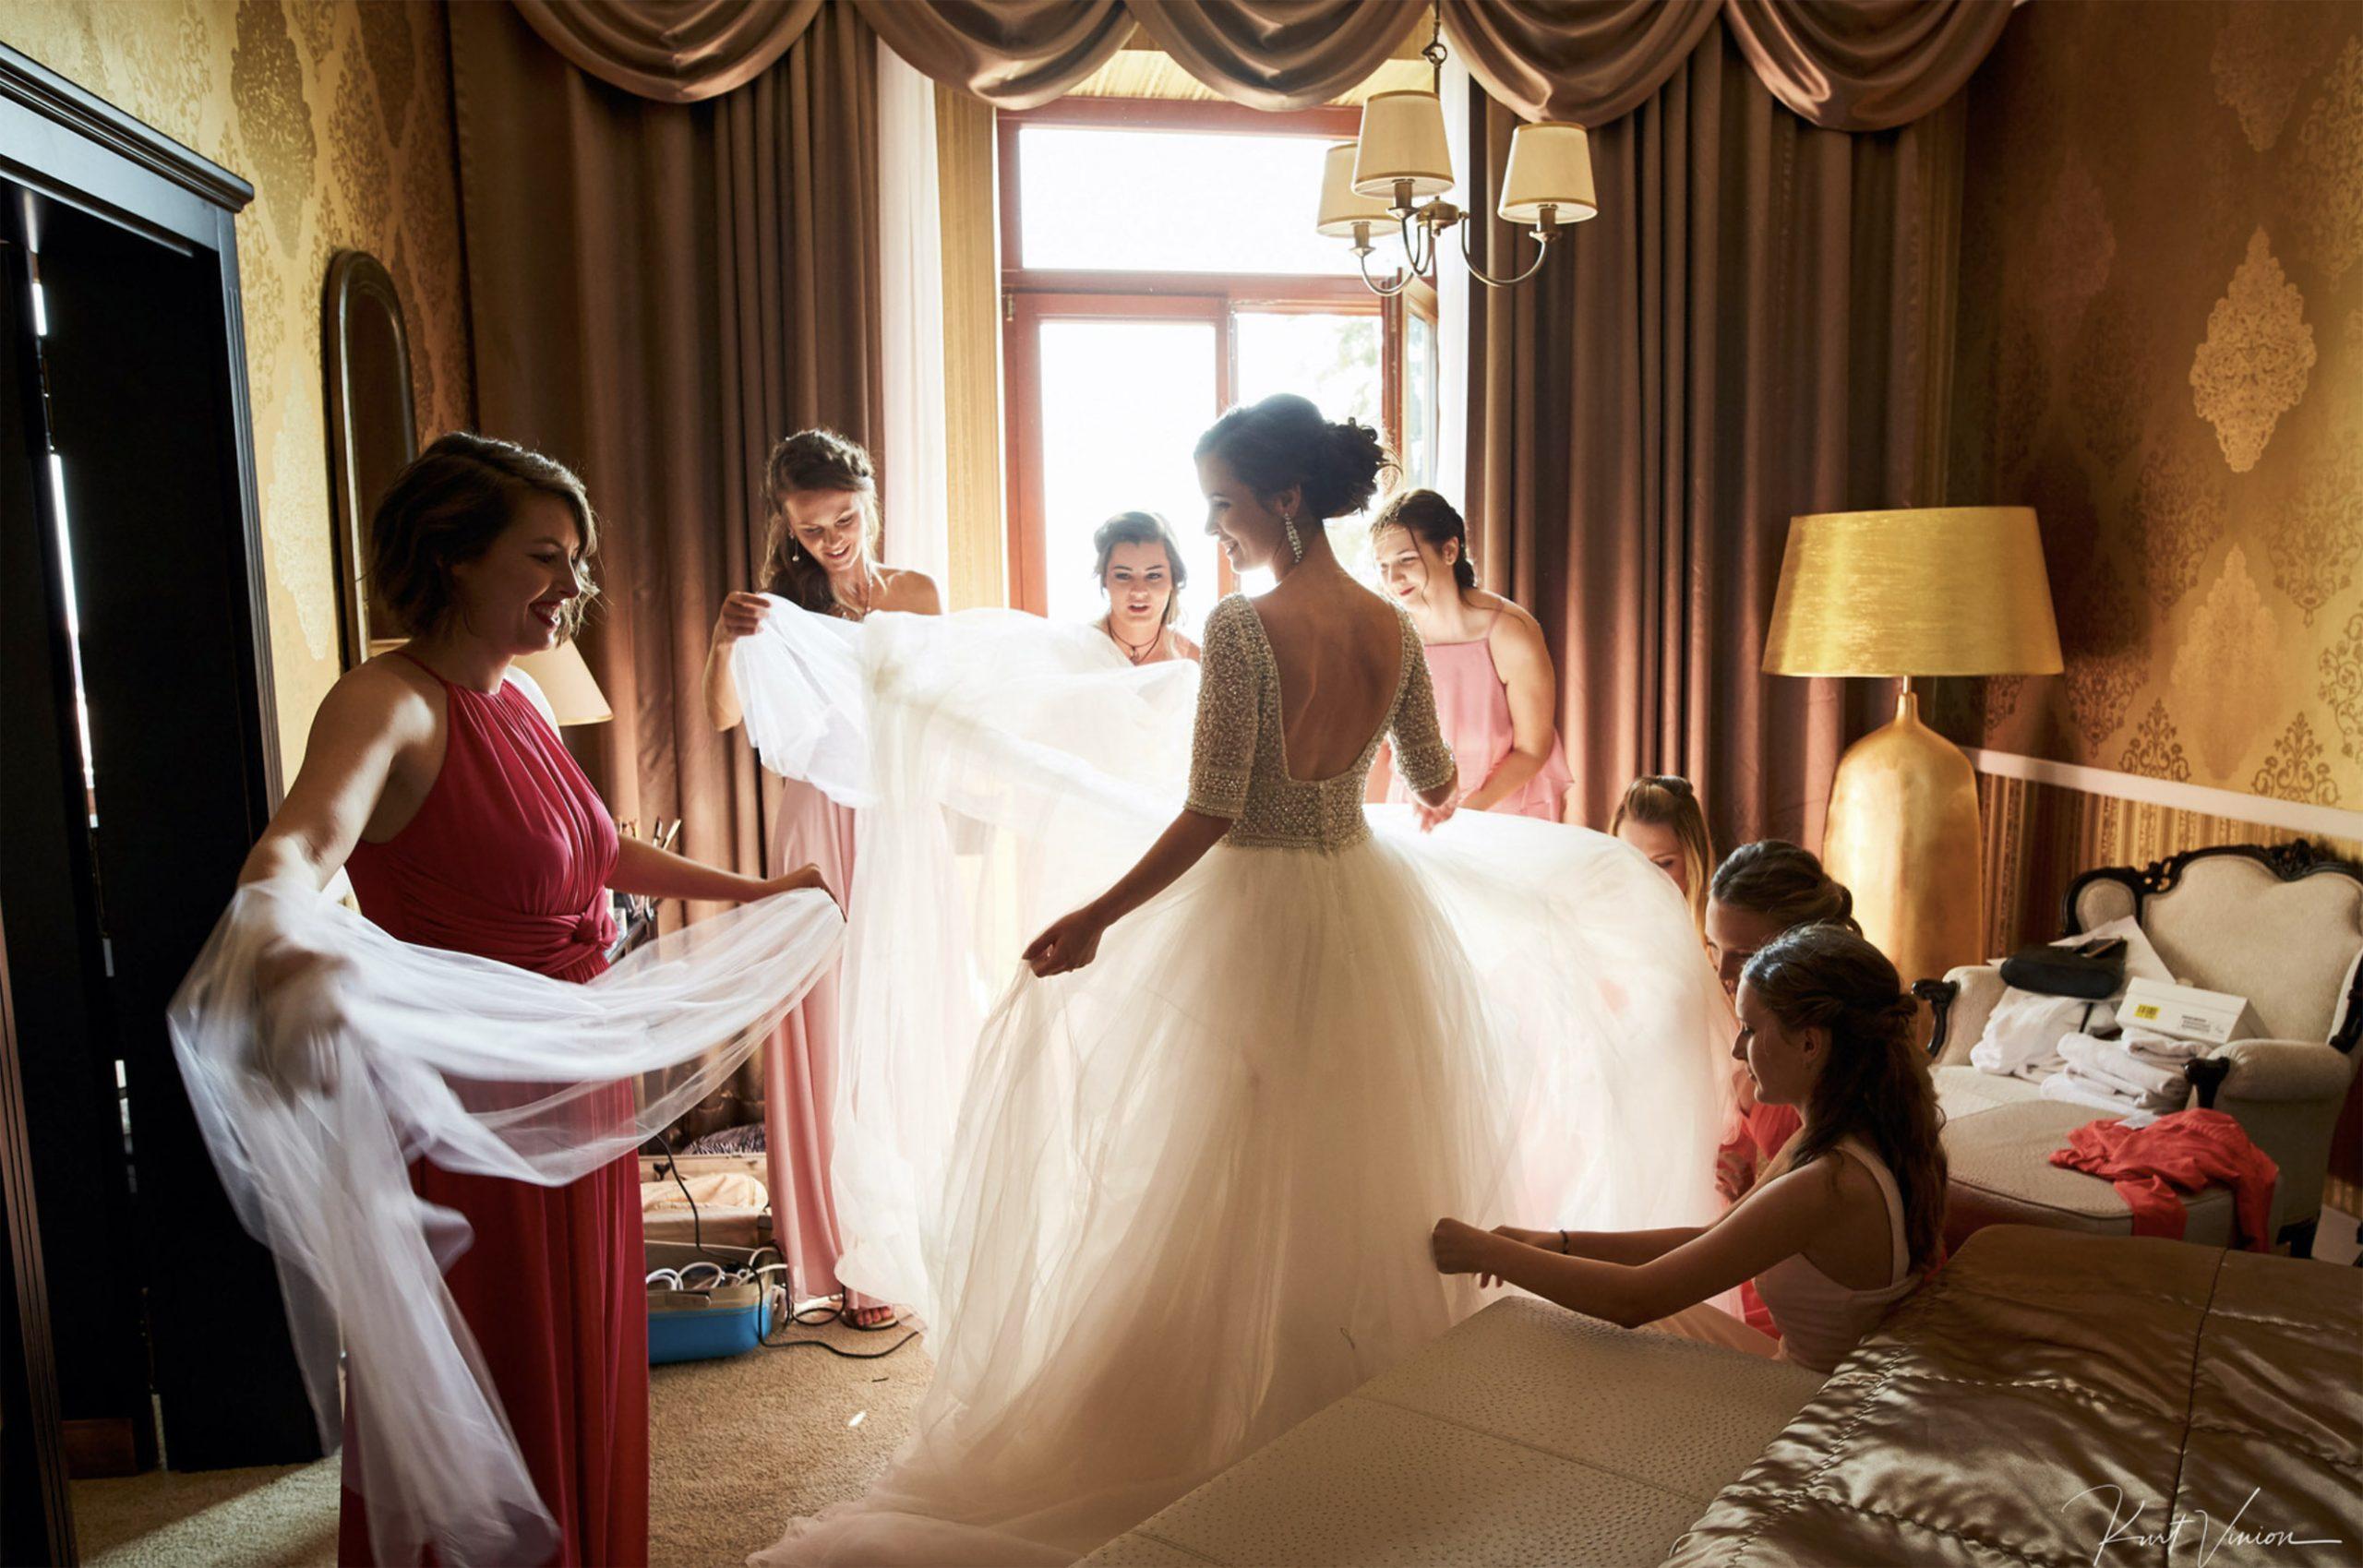 Kurt-Vinion-Prague-Wedding-Photographer-10